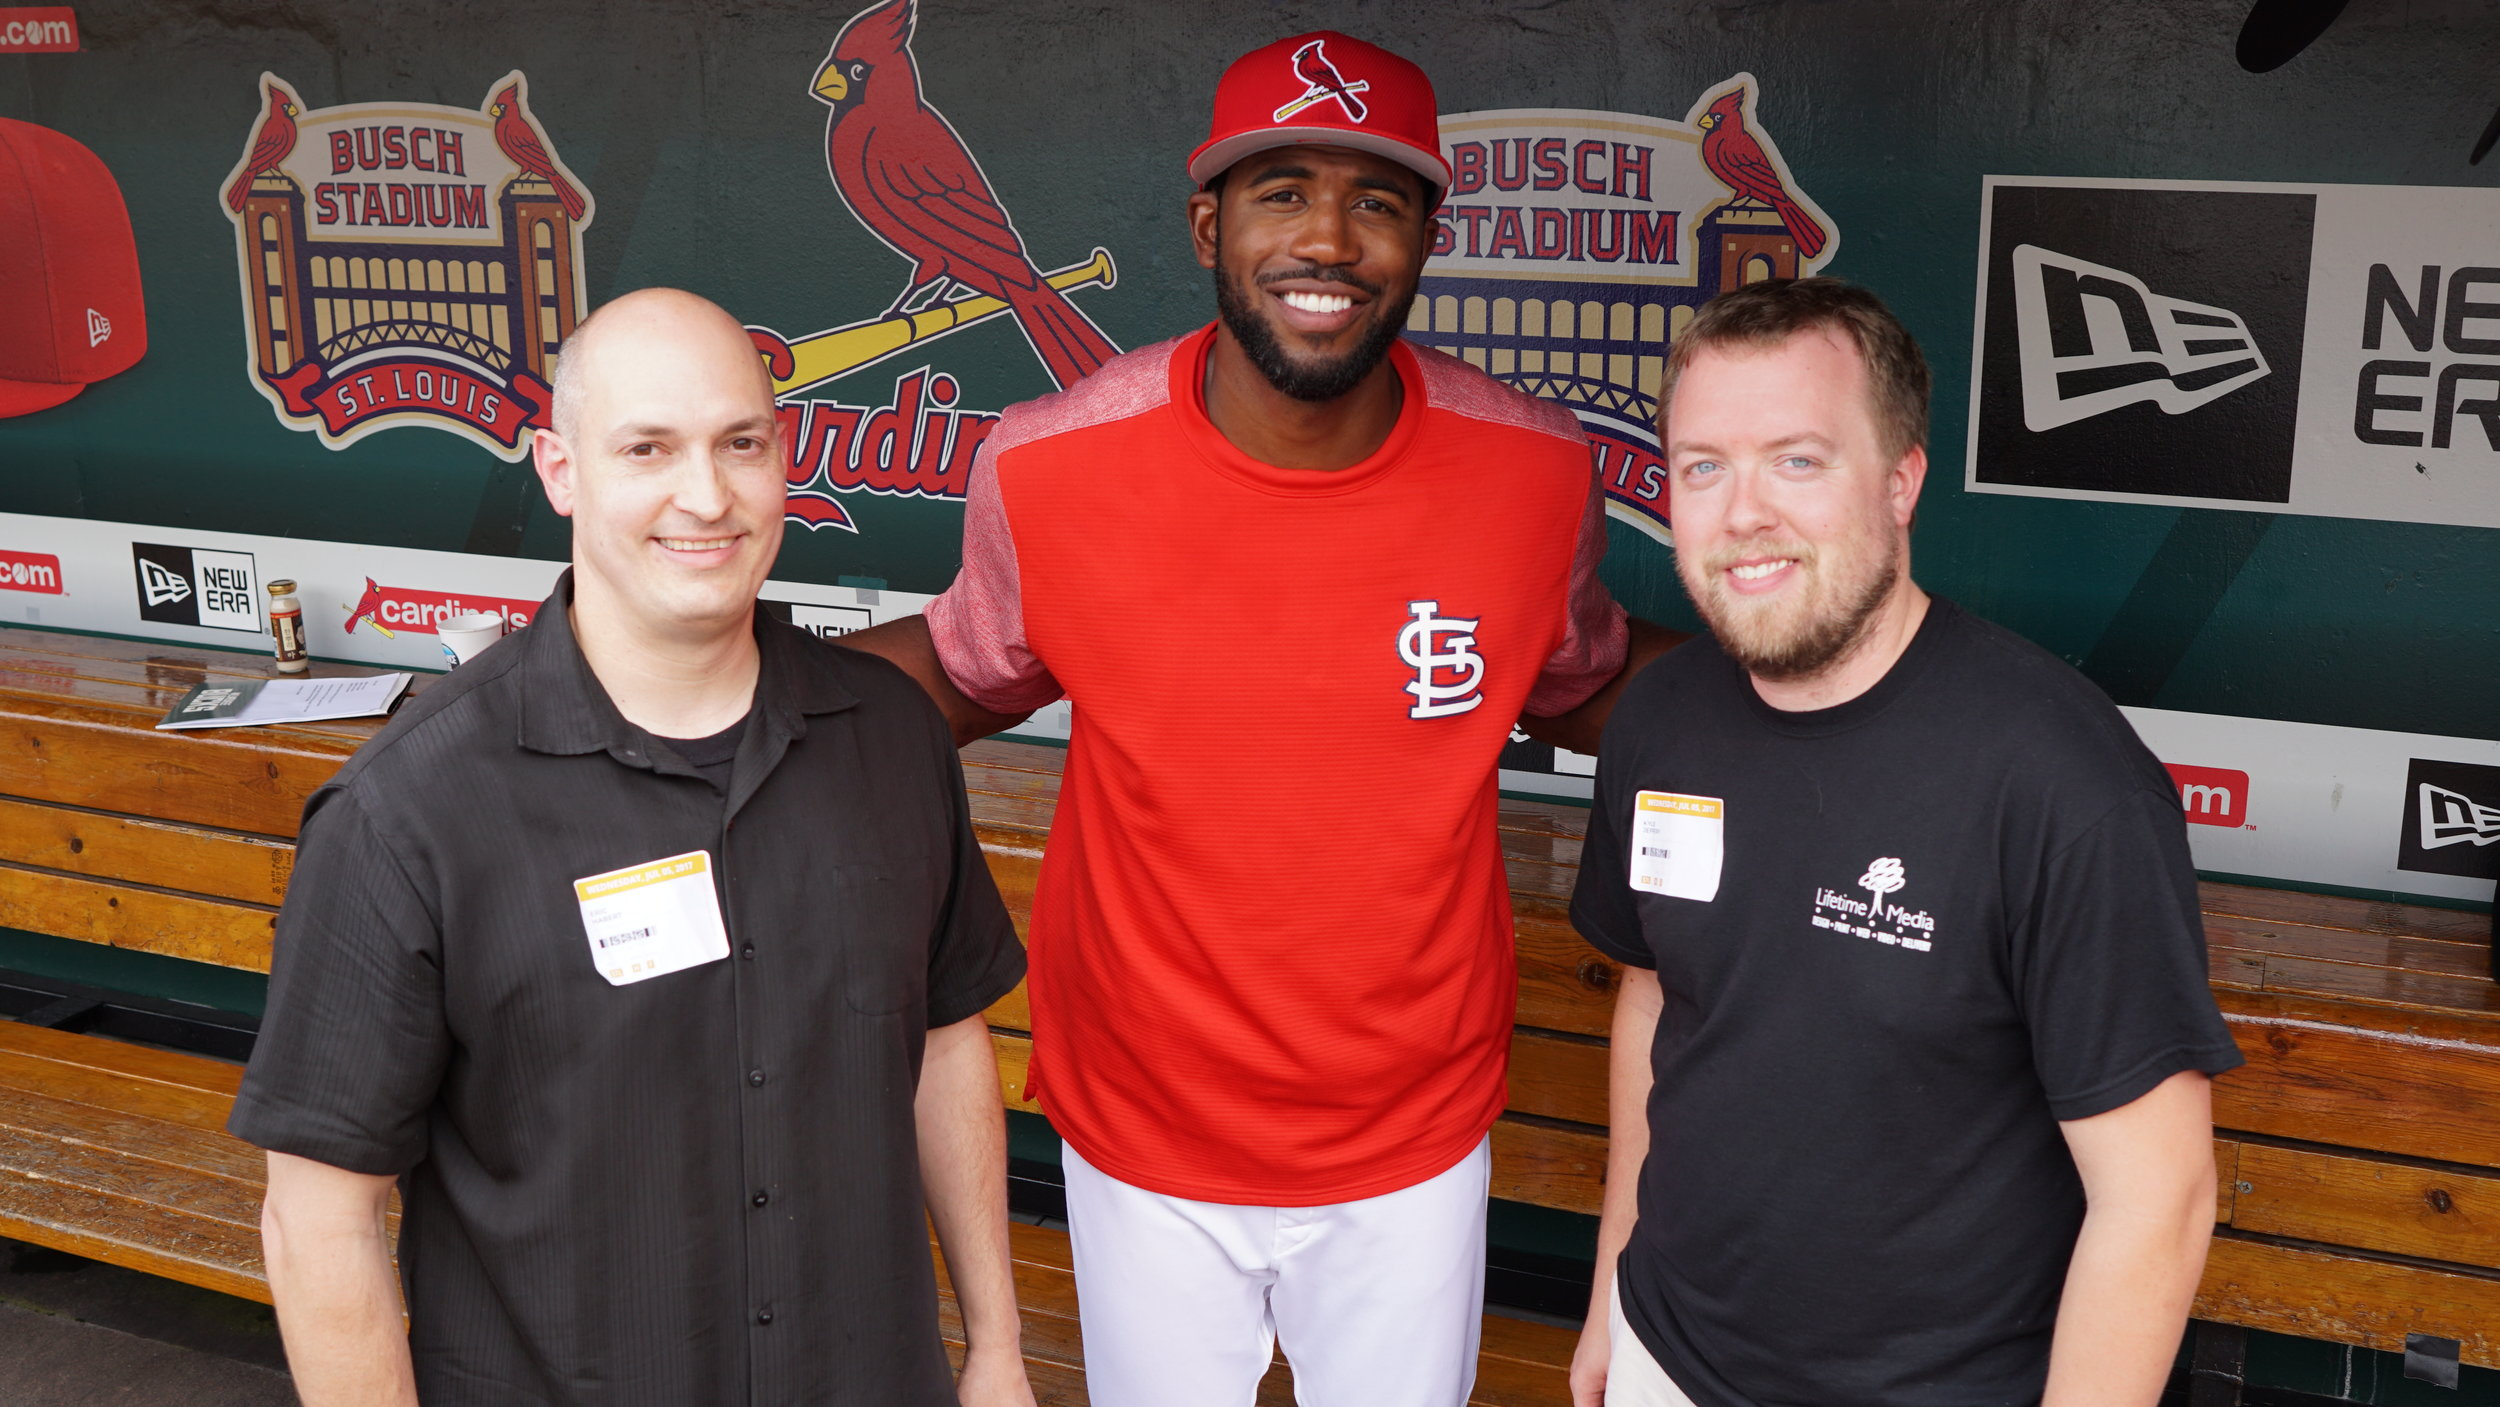 LTM team with Cardinal's player Dexter Fowler.